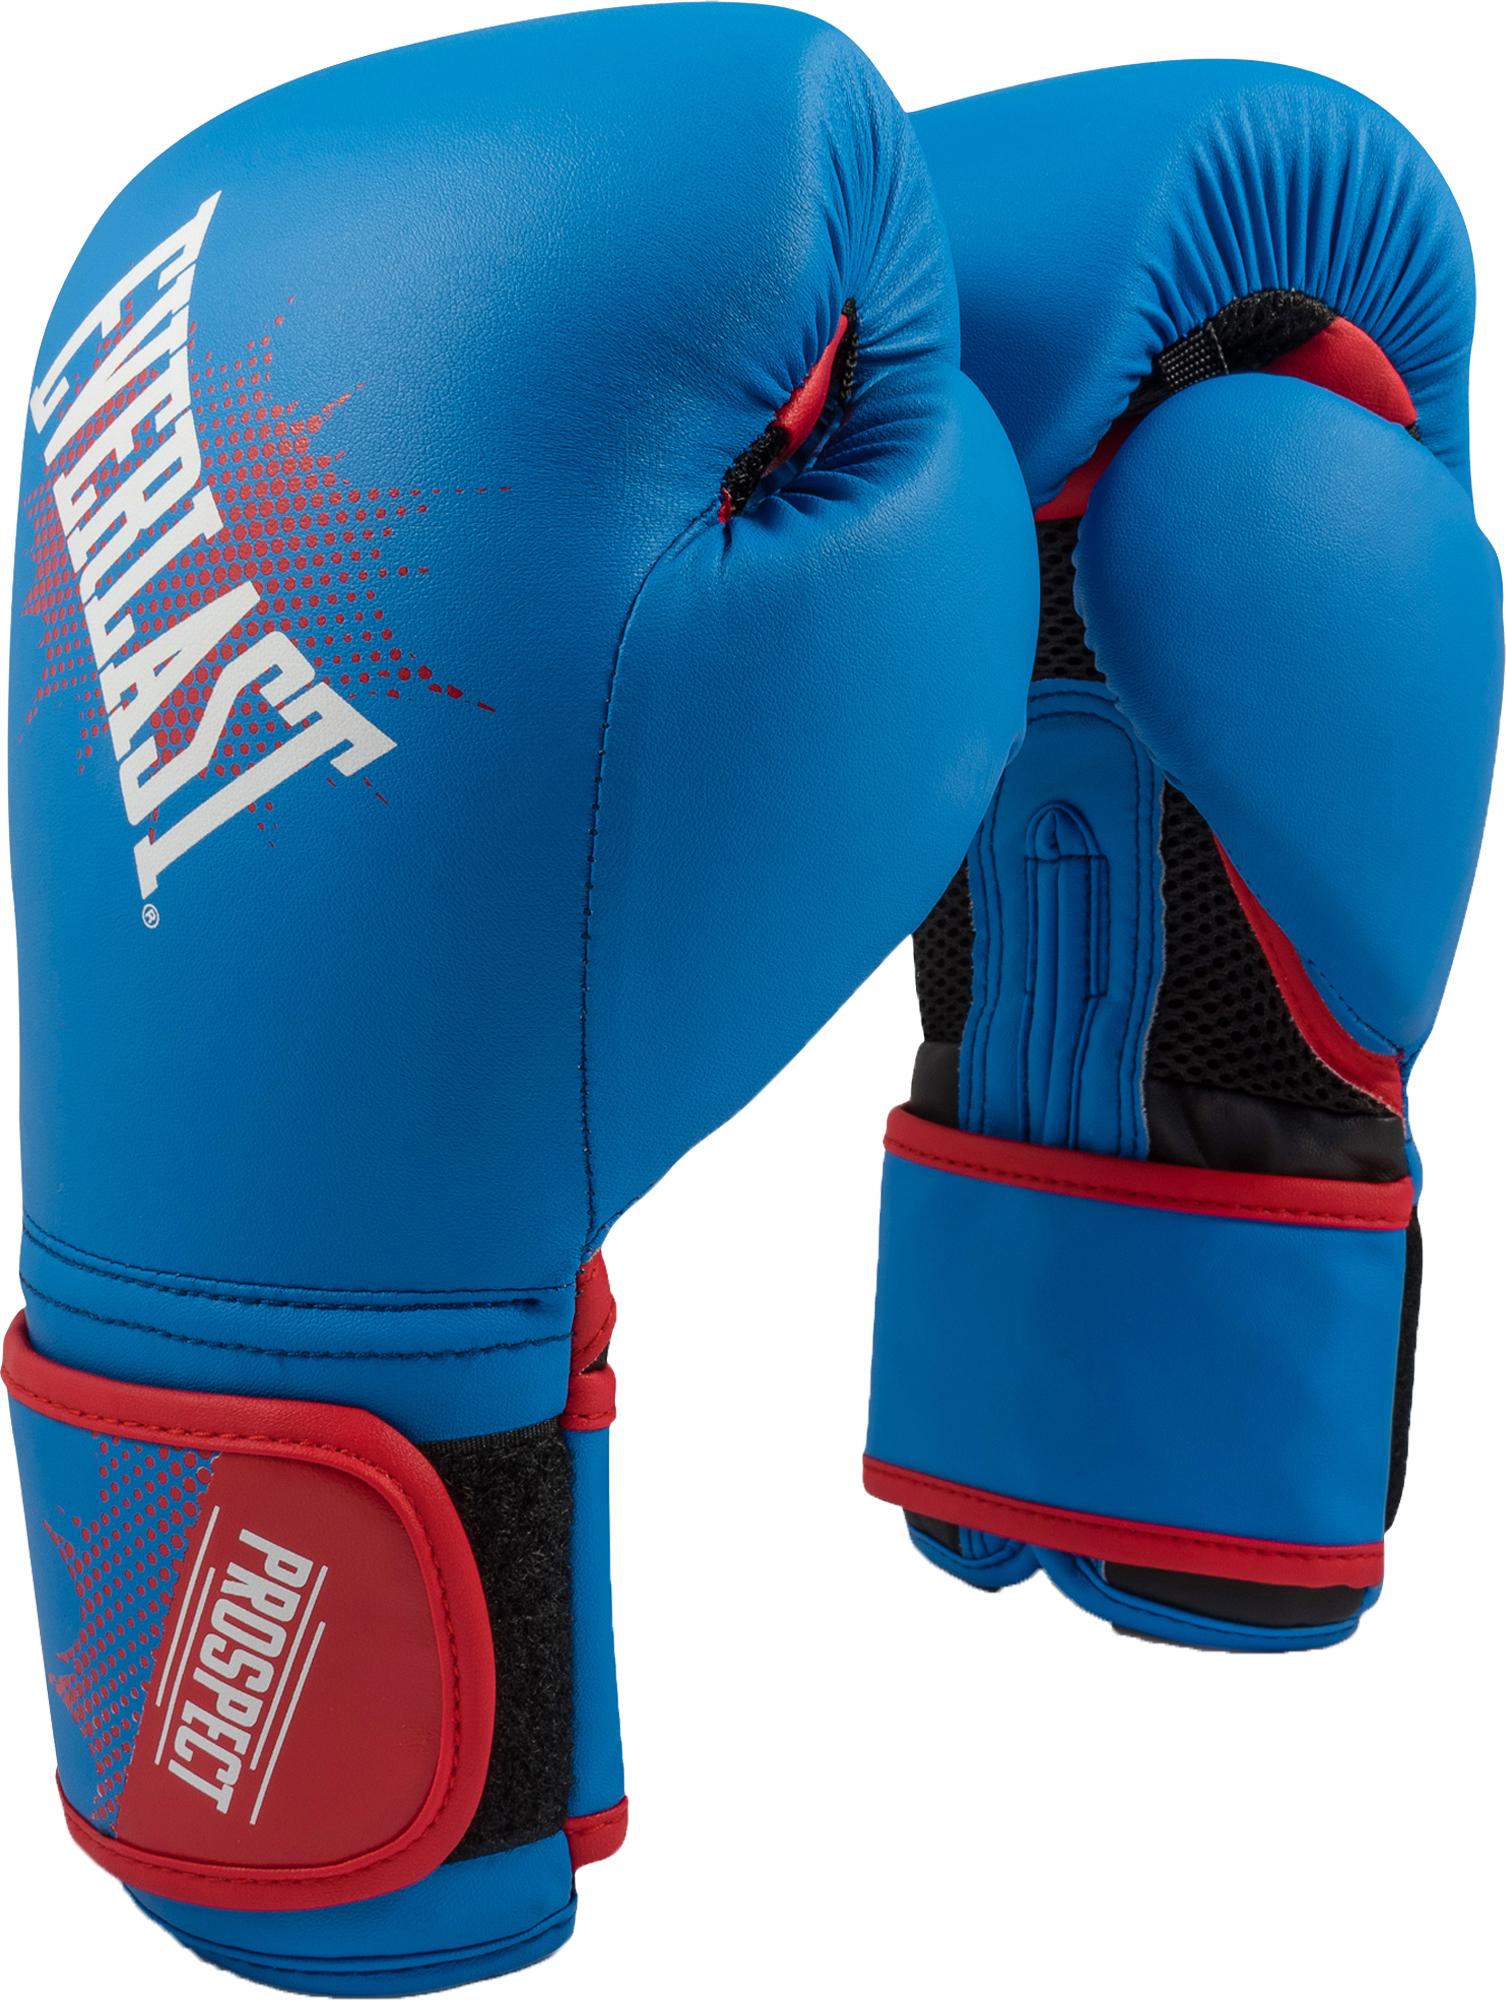 Everlast Перчатки боксерские детские Everlast Prospect, размер 8 oz цена